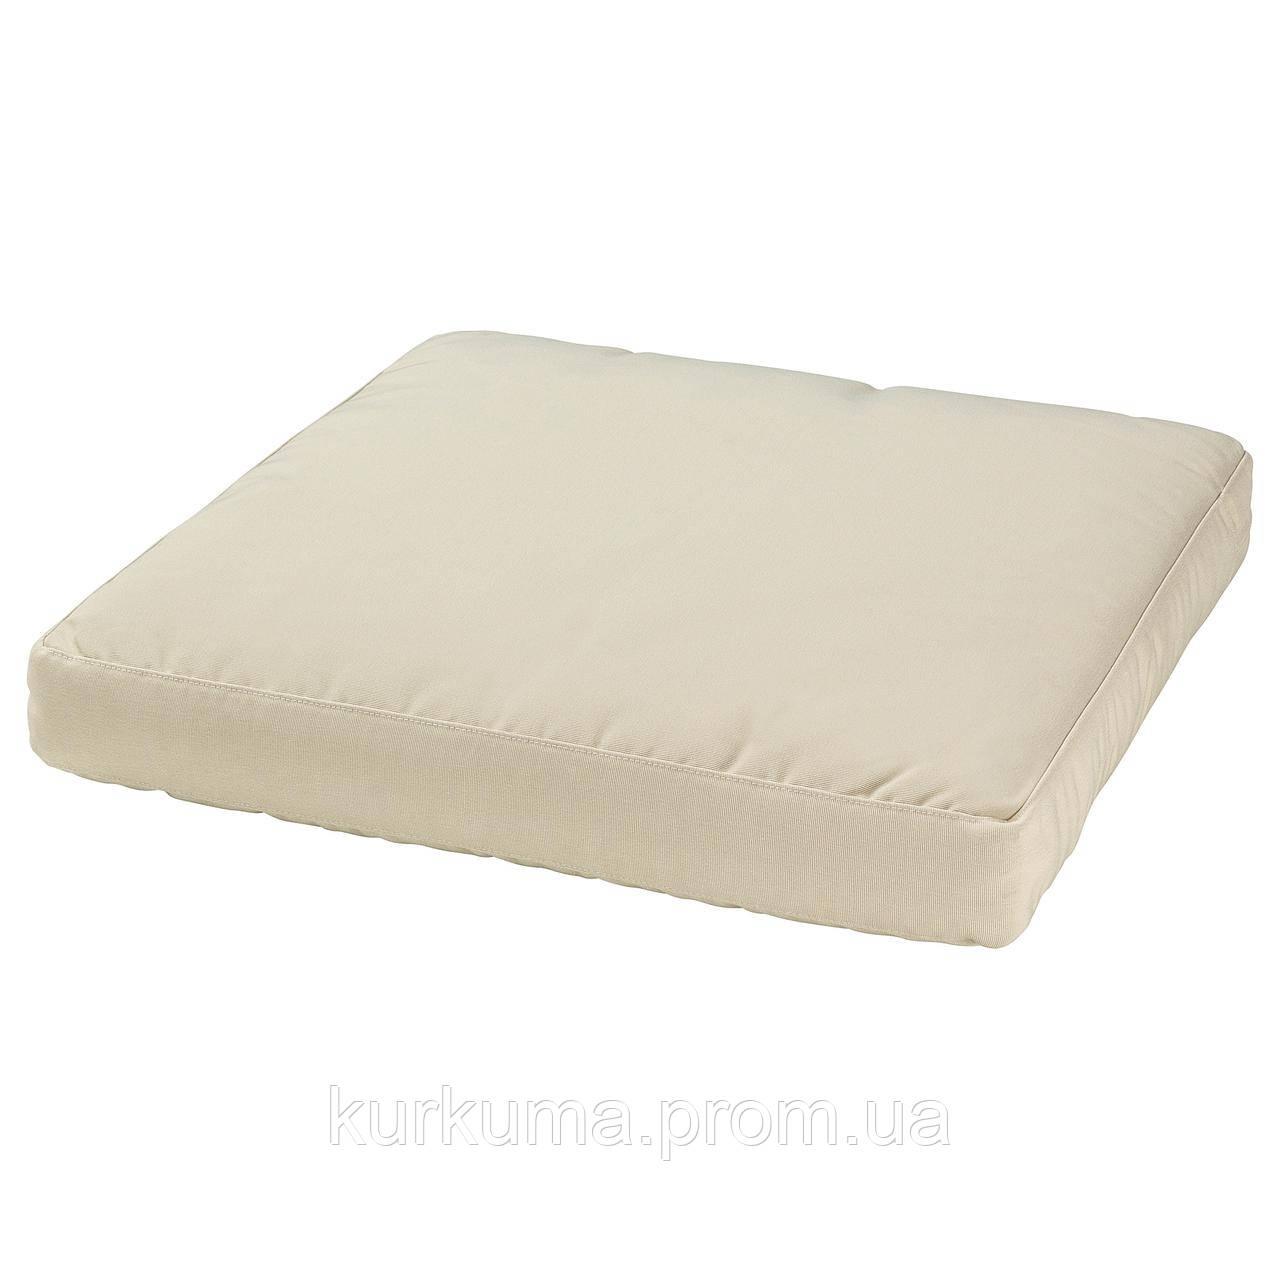 IKEA HALLO Подушка для садового кресла, бежевый  (002.600.74)